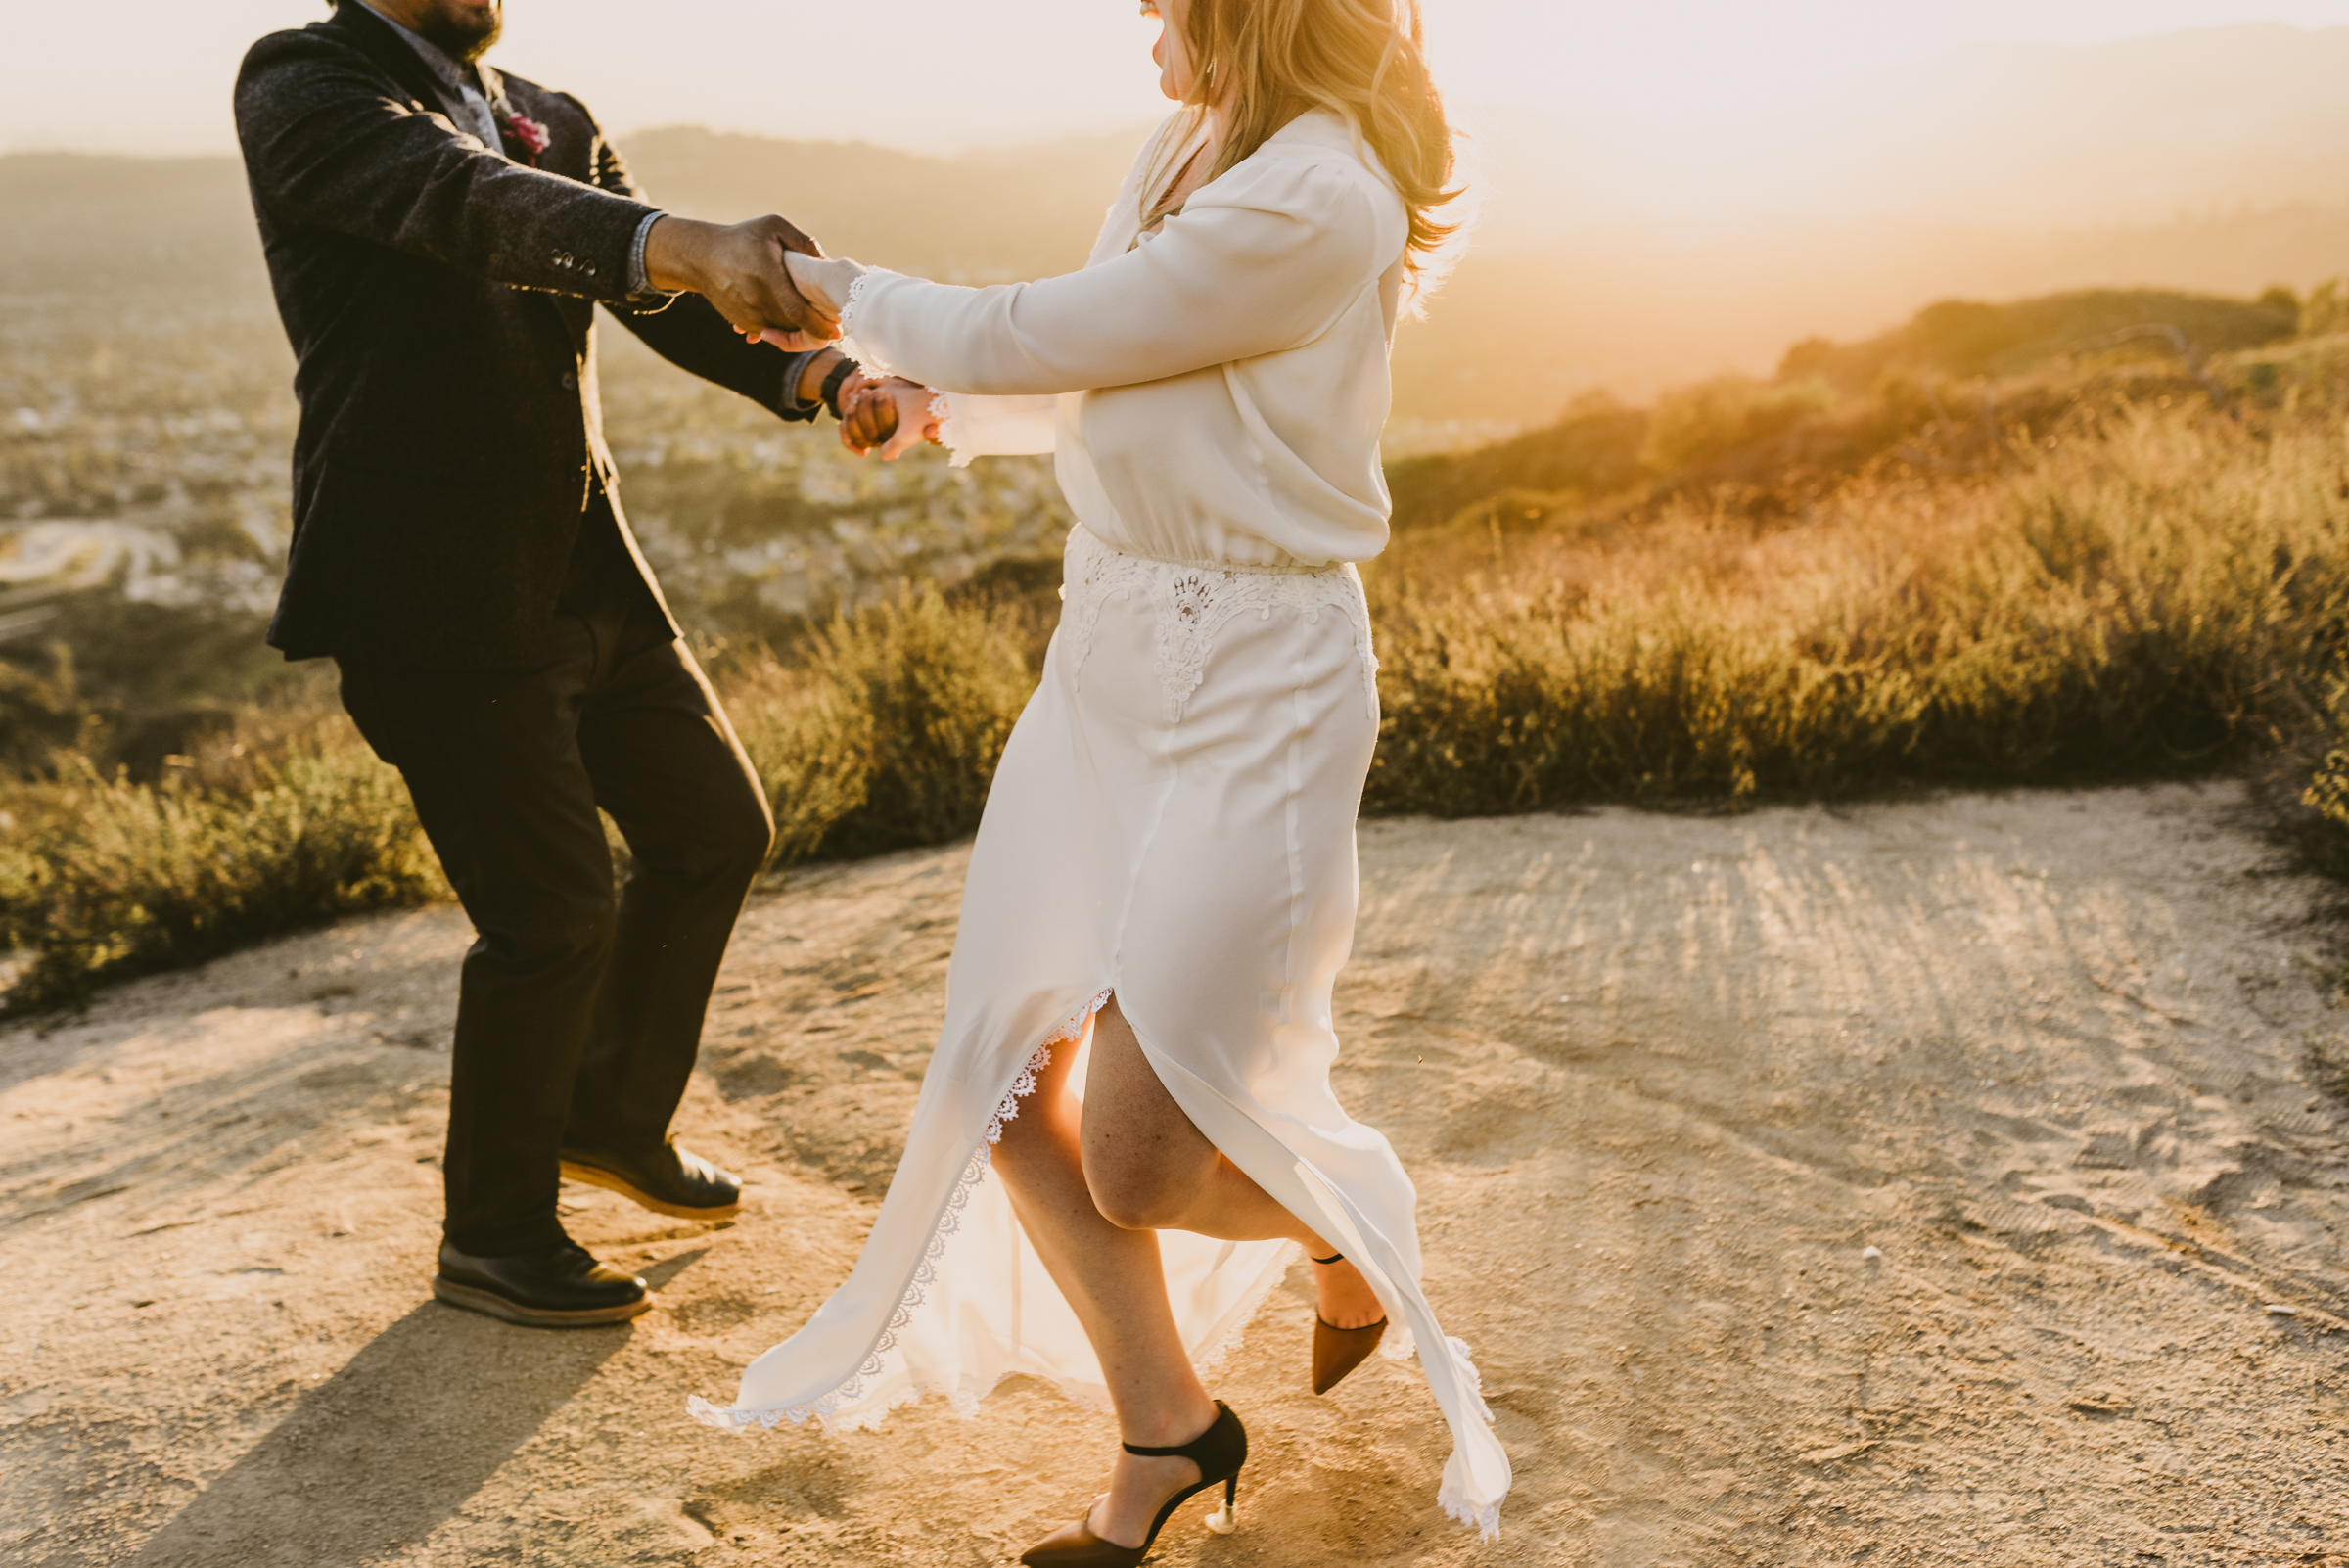 ©Isaiah + Taylor Photography - Intimate Elopement, Eaton Canyon, Los Angeles Wedding Photographer-79.jpg